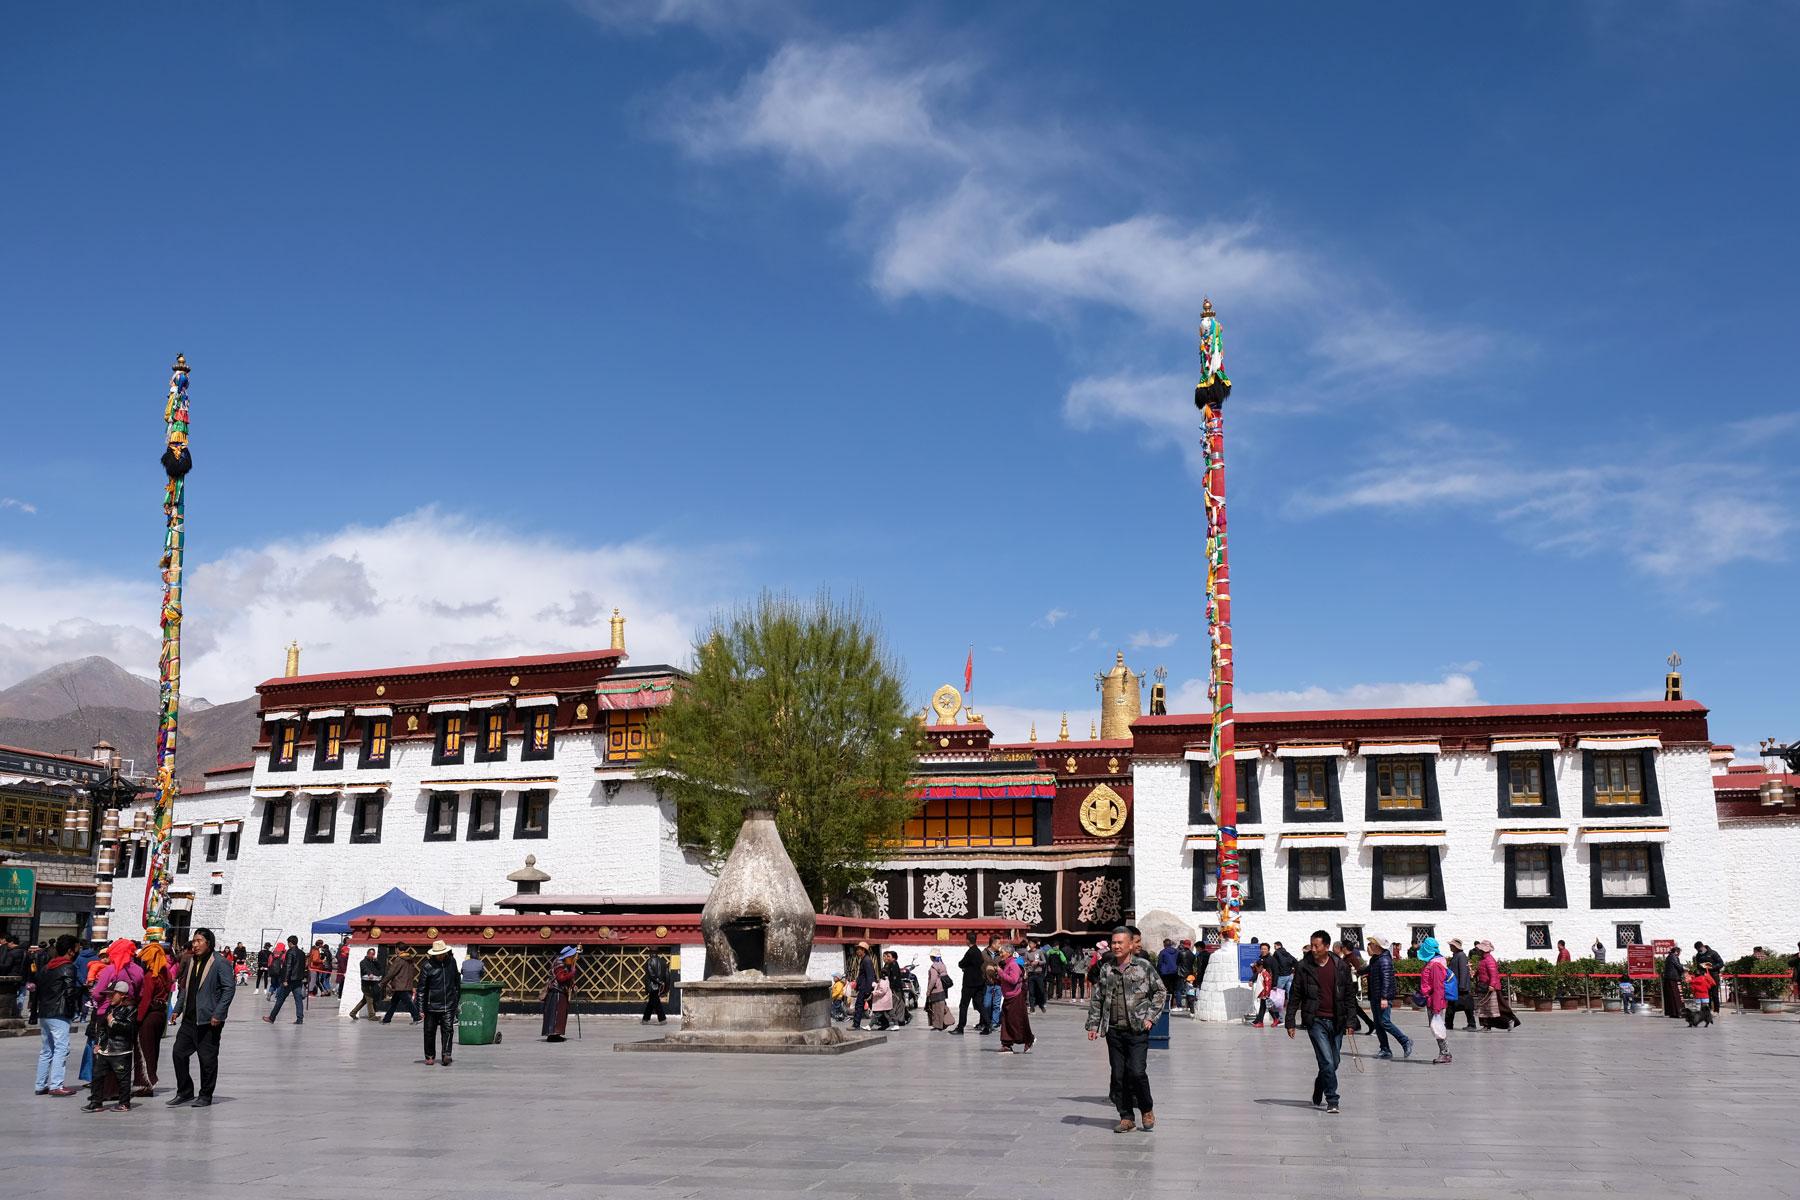 Der Jokhang-Tempel ist das bedeutenste Heiligtum im Zentrum Lhasas in Tibet.